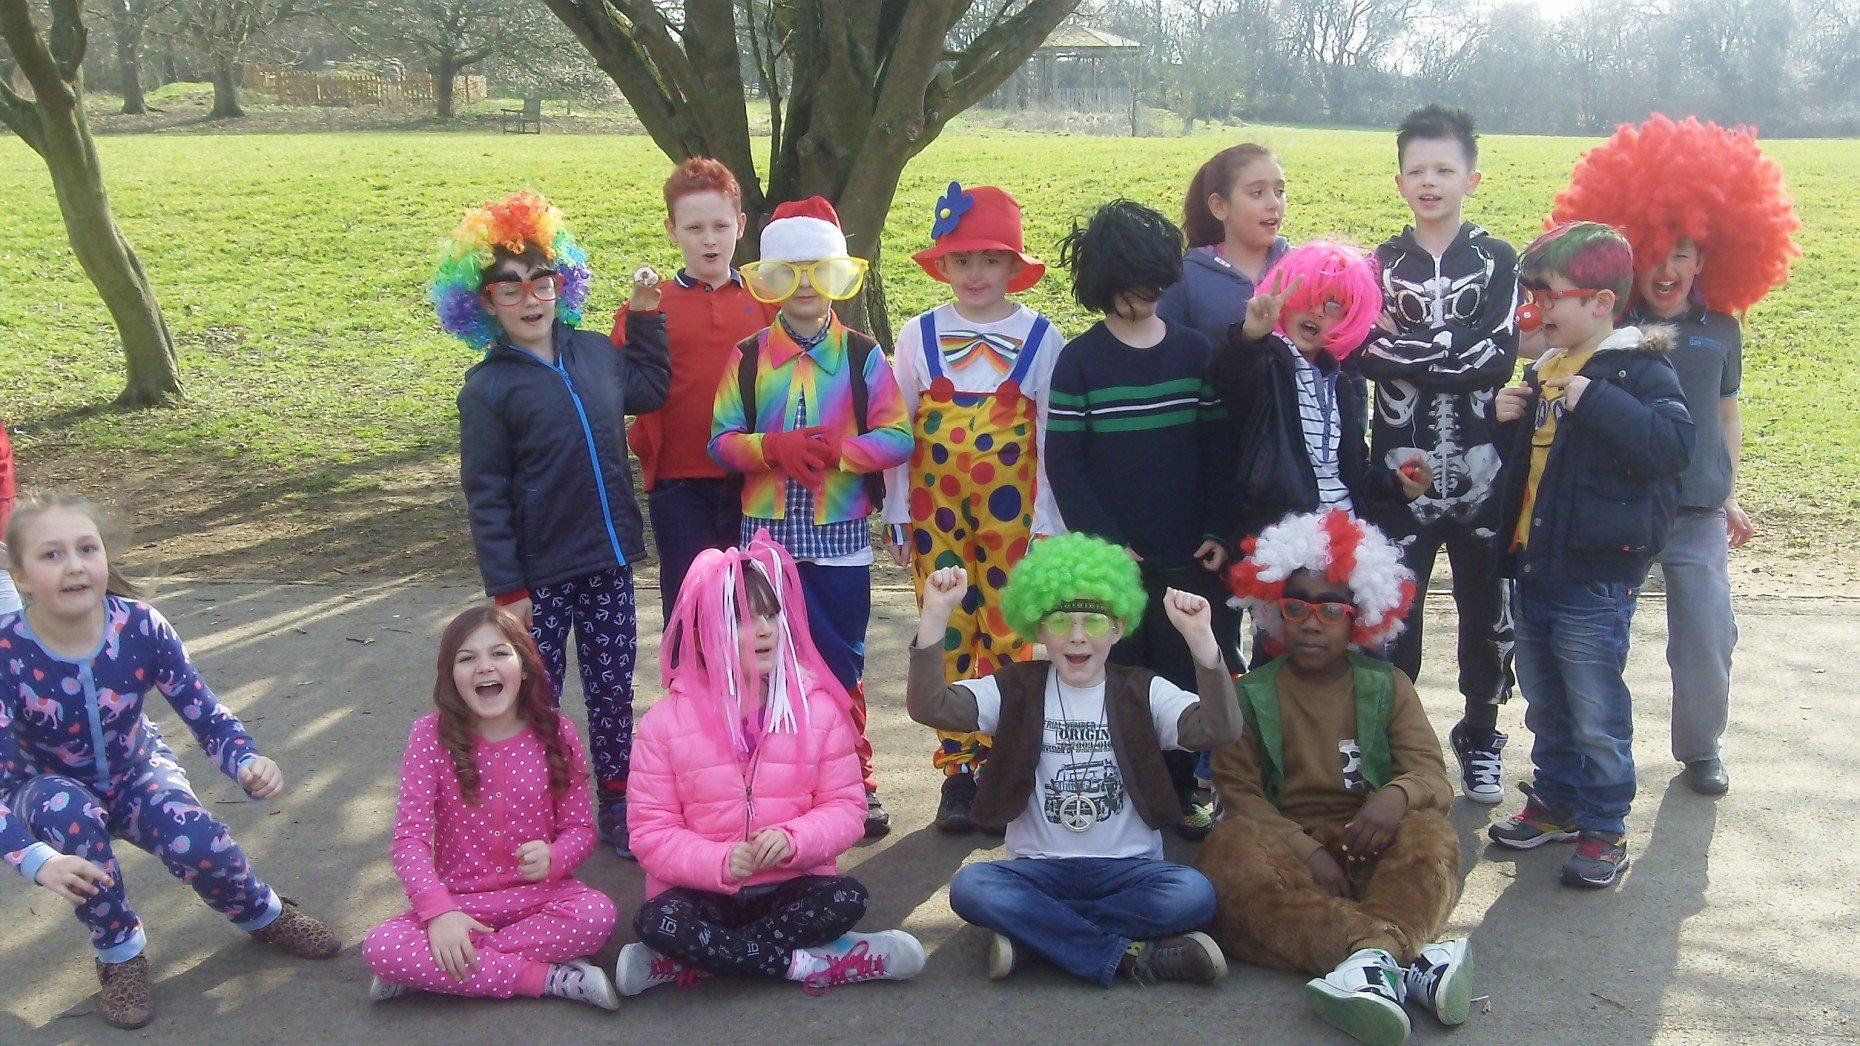 All together Nettleham Church of England Aided Junior School raised £1,200